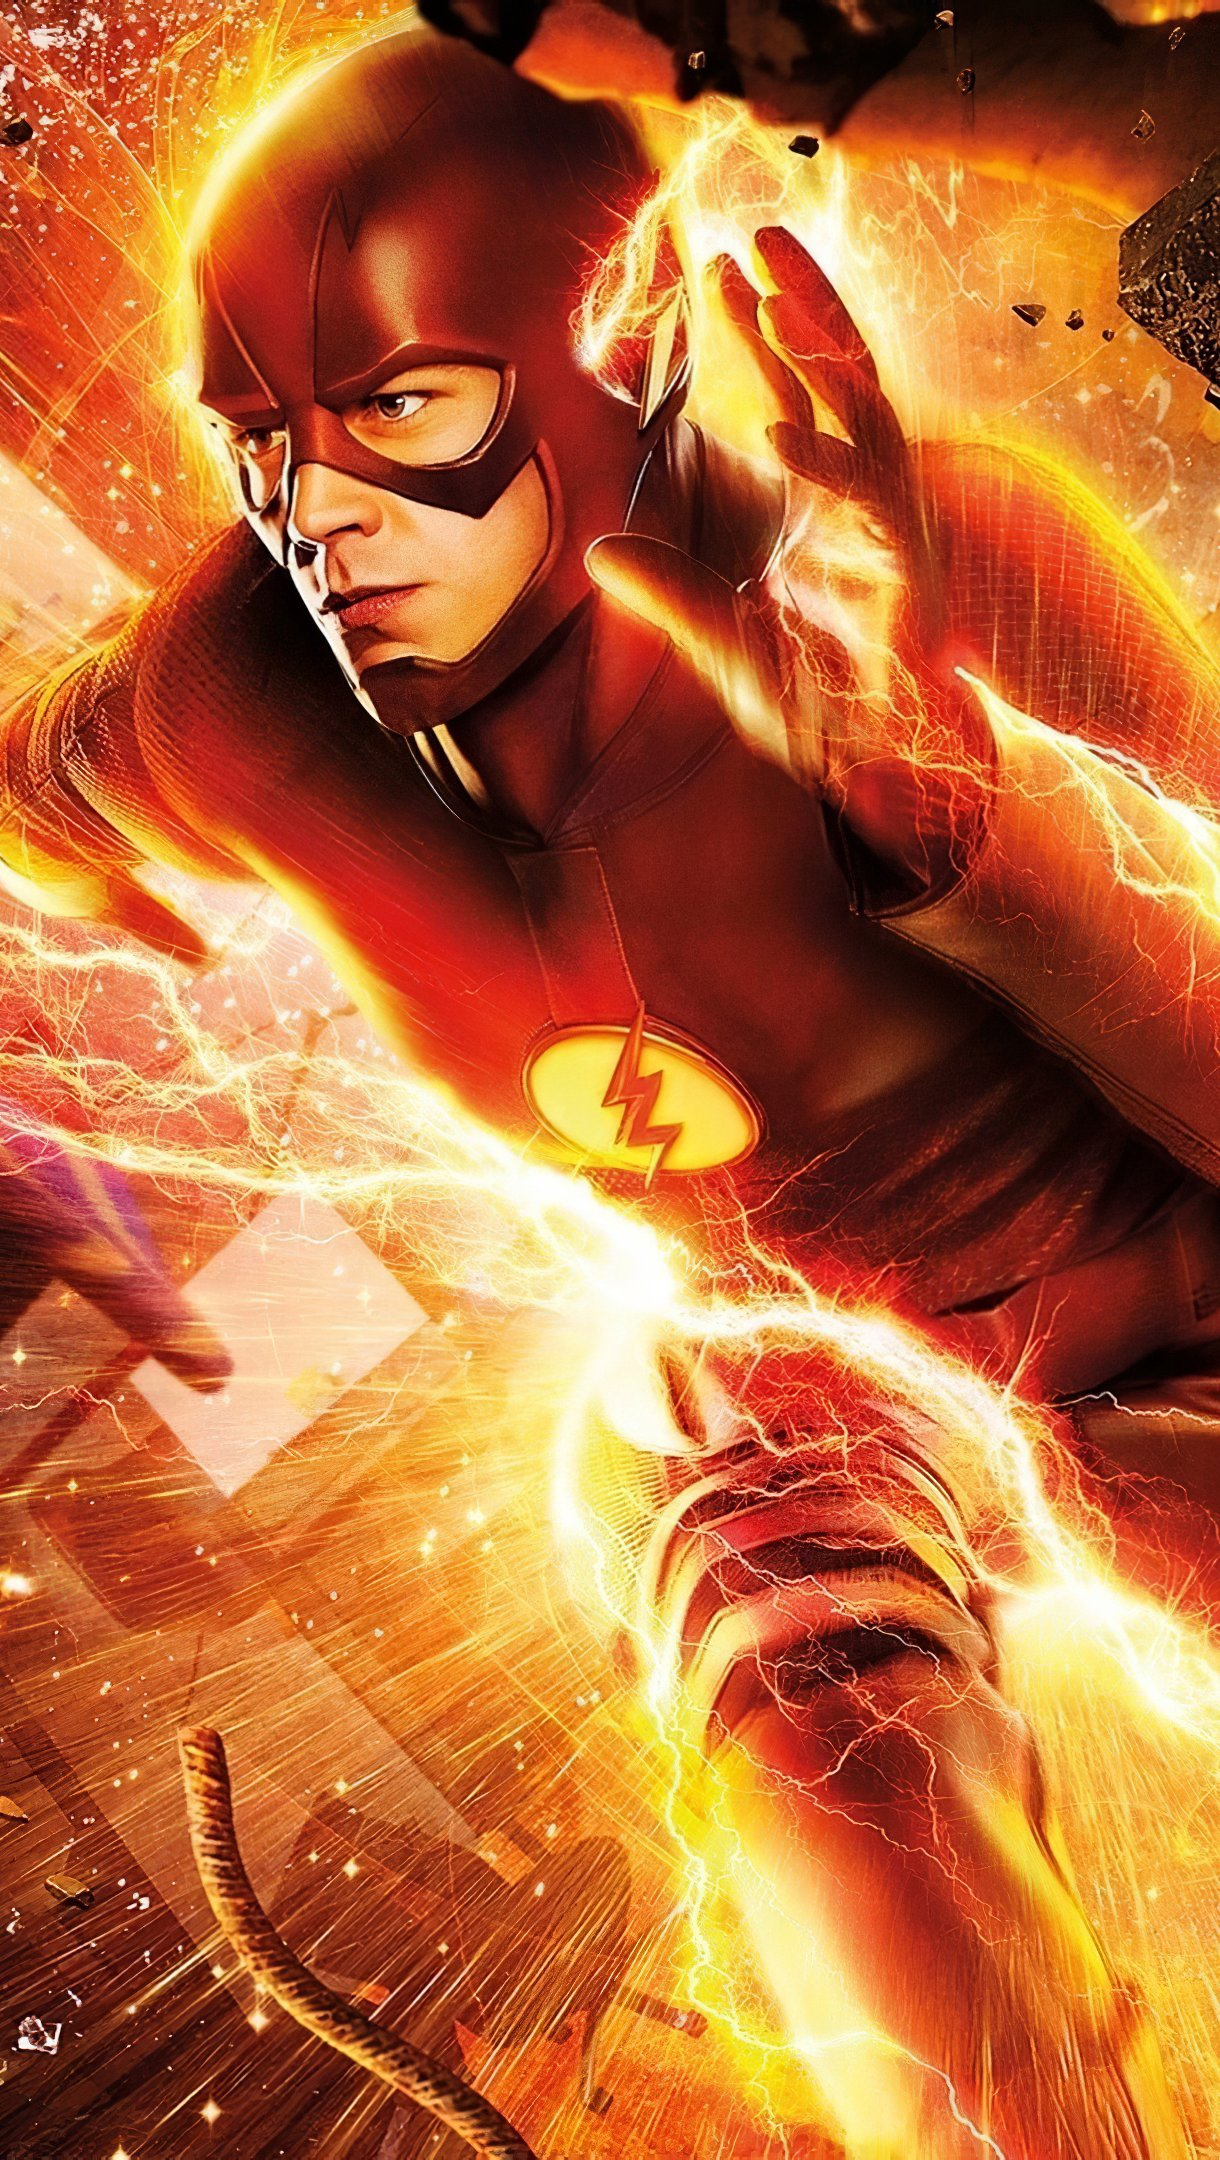 Wallpaper Gastin Gustin running as Flash Vertical